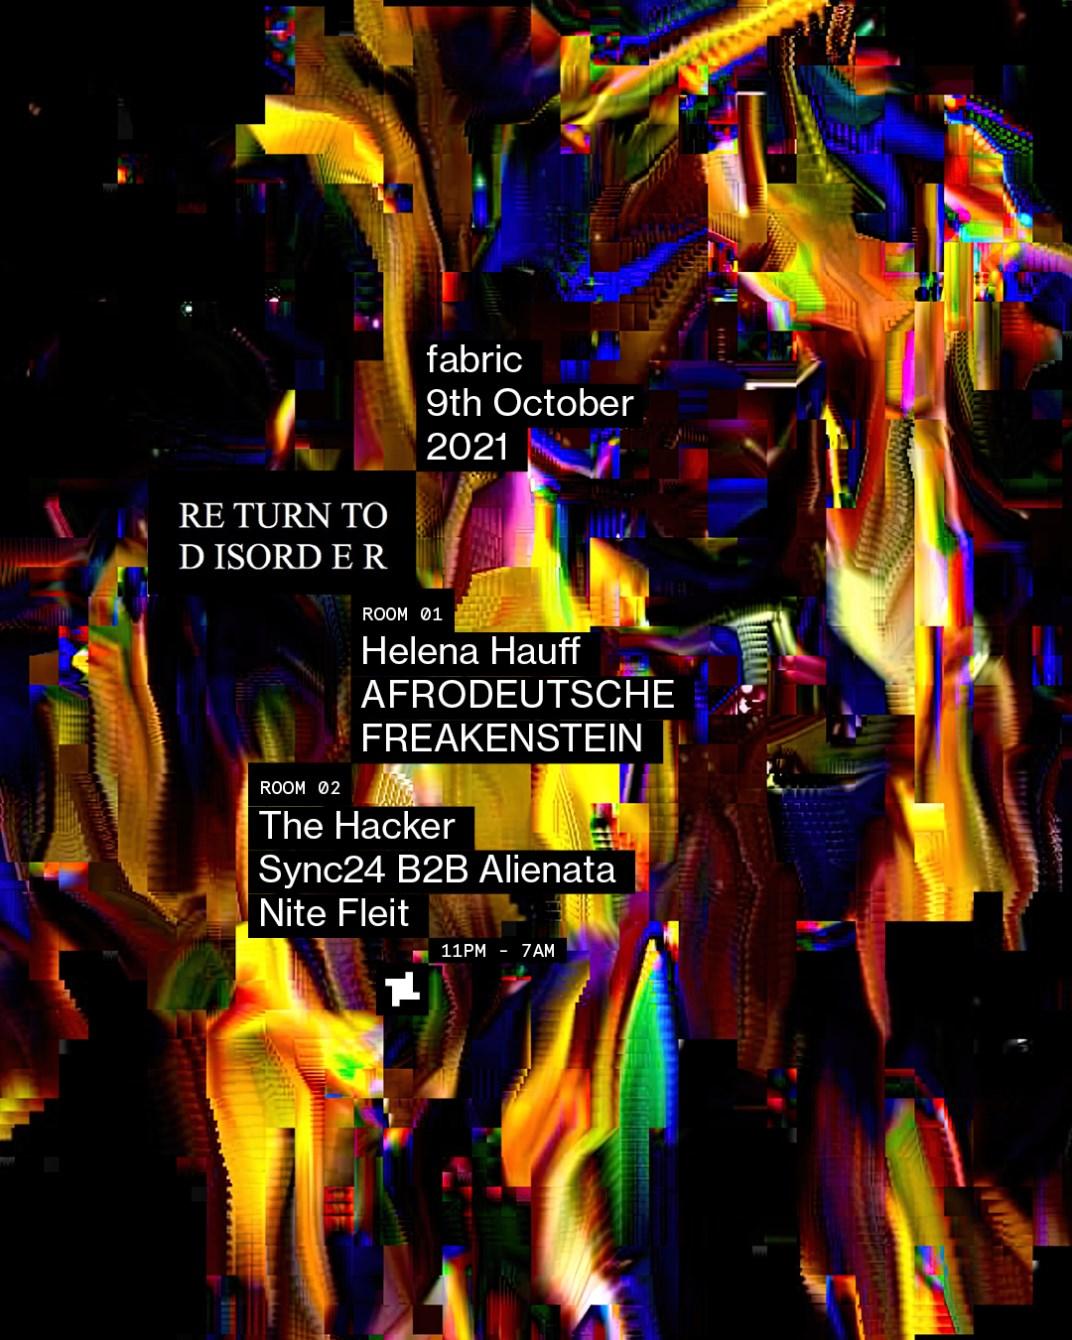 fabric: Return to Disorder - Helena Hauff, Afrodeutsche, The Hacker & More - Flyer front